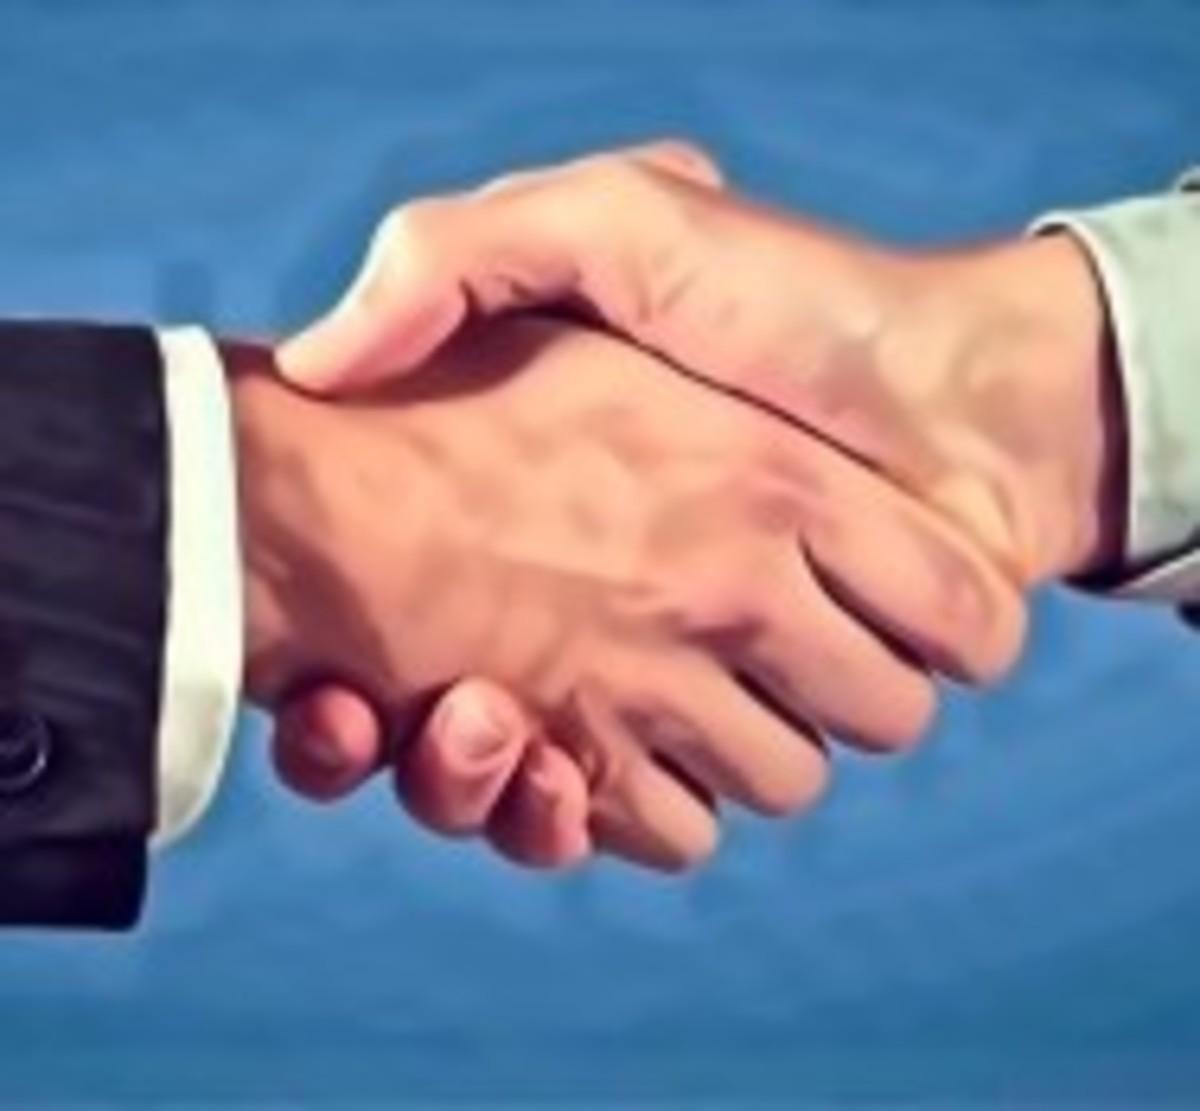 Human handshakes are different than dog handshakes.